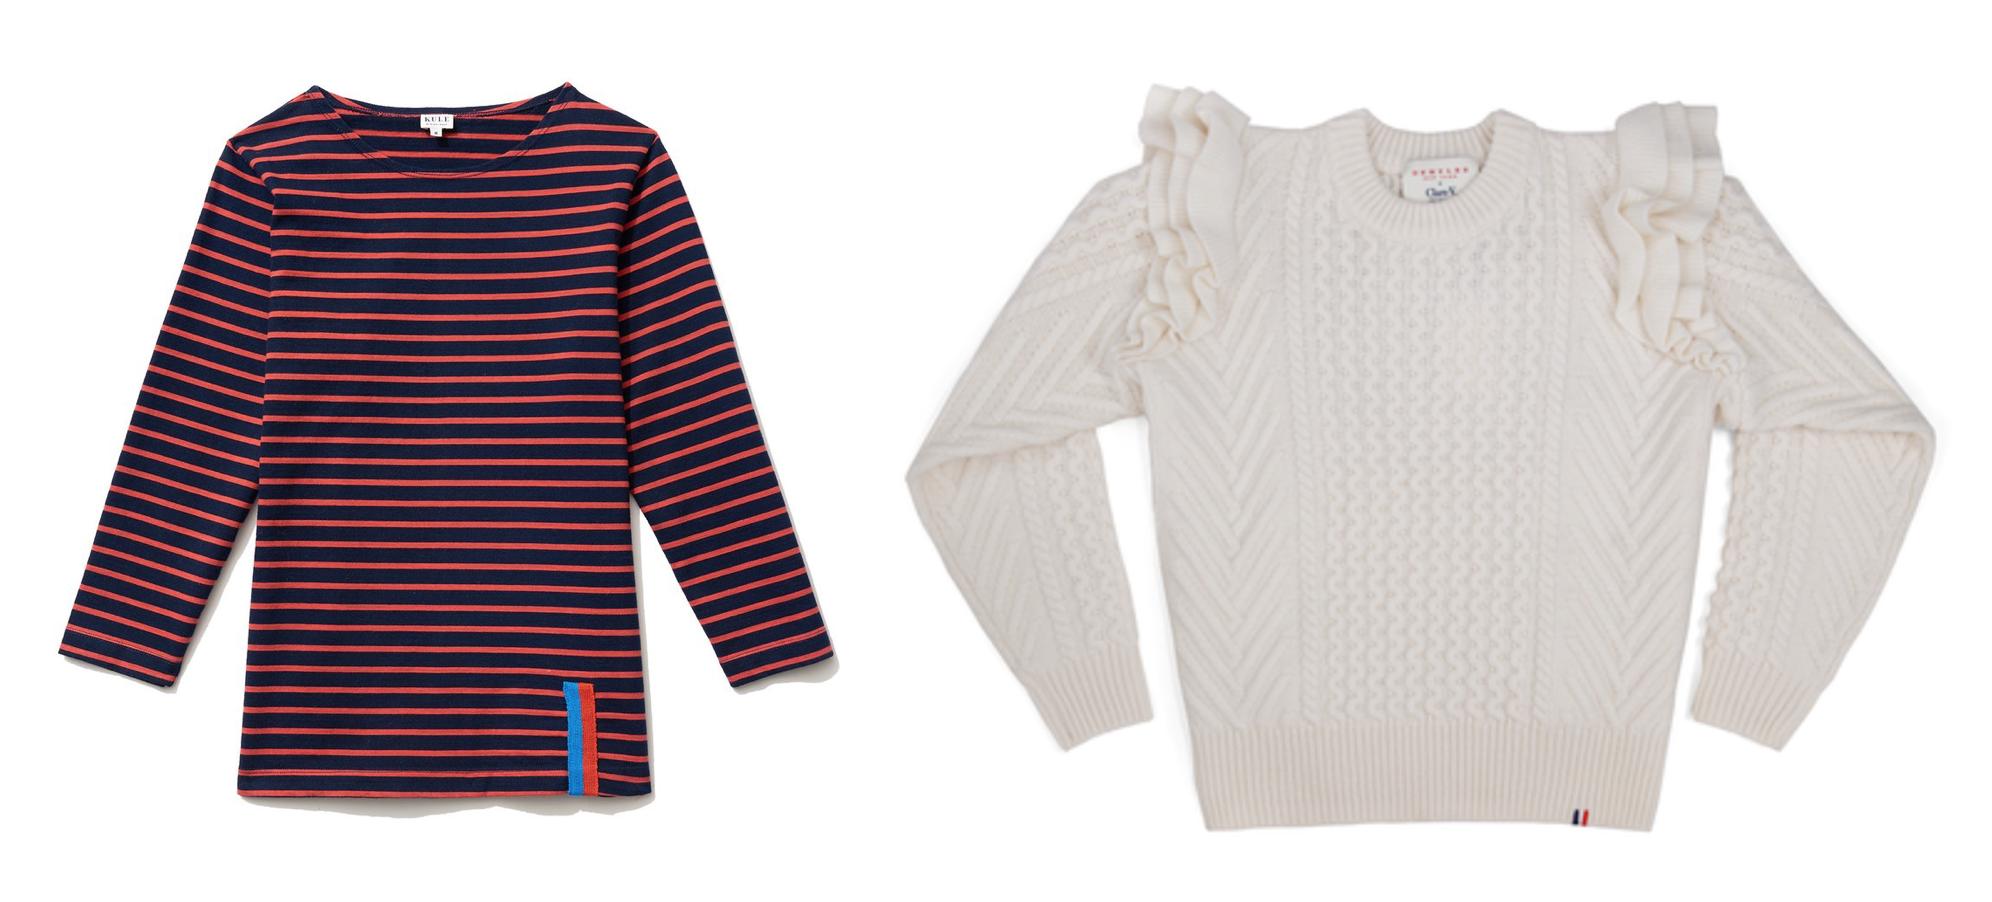 Kule shirt (left) &Claire Vivier sweater (right)